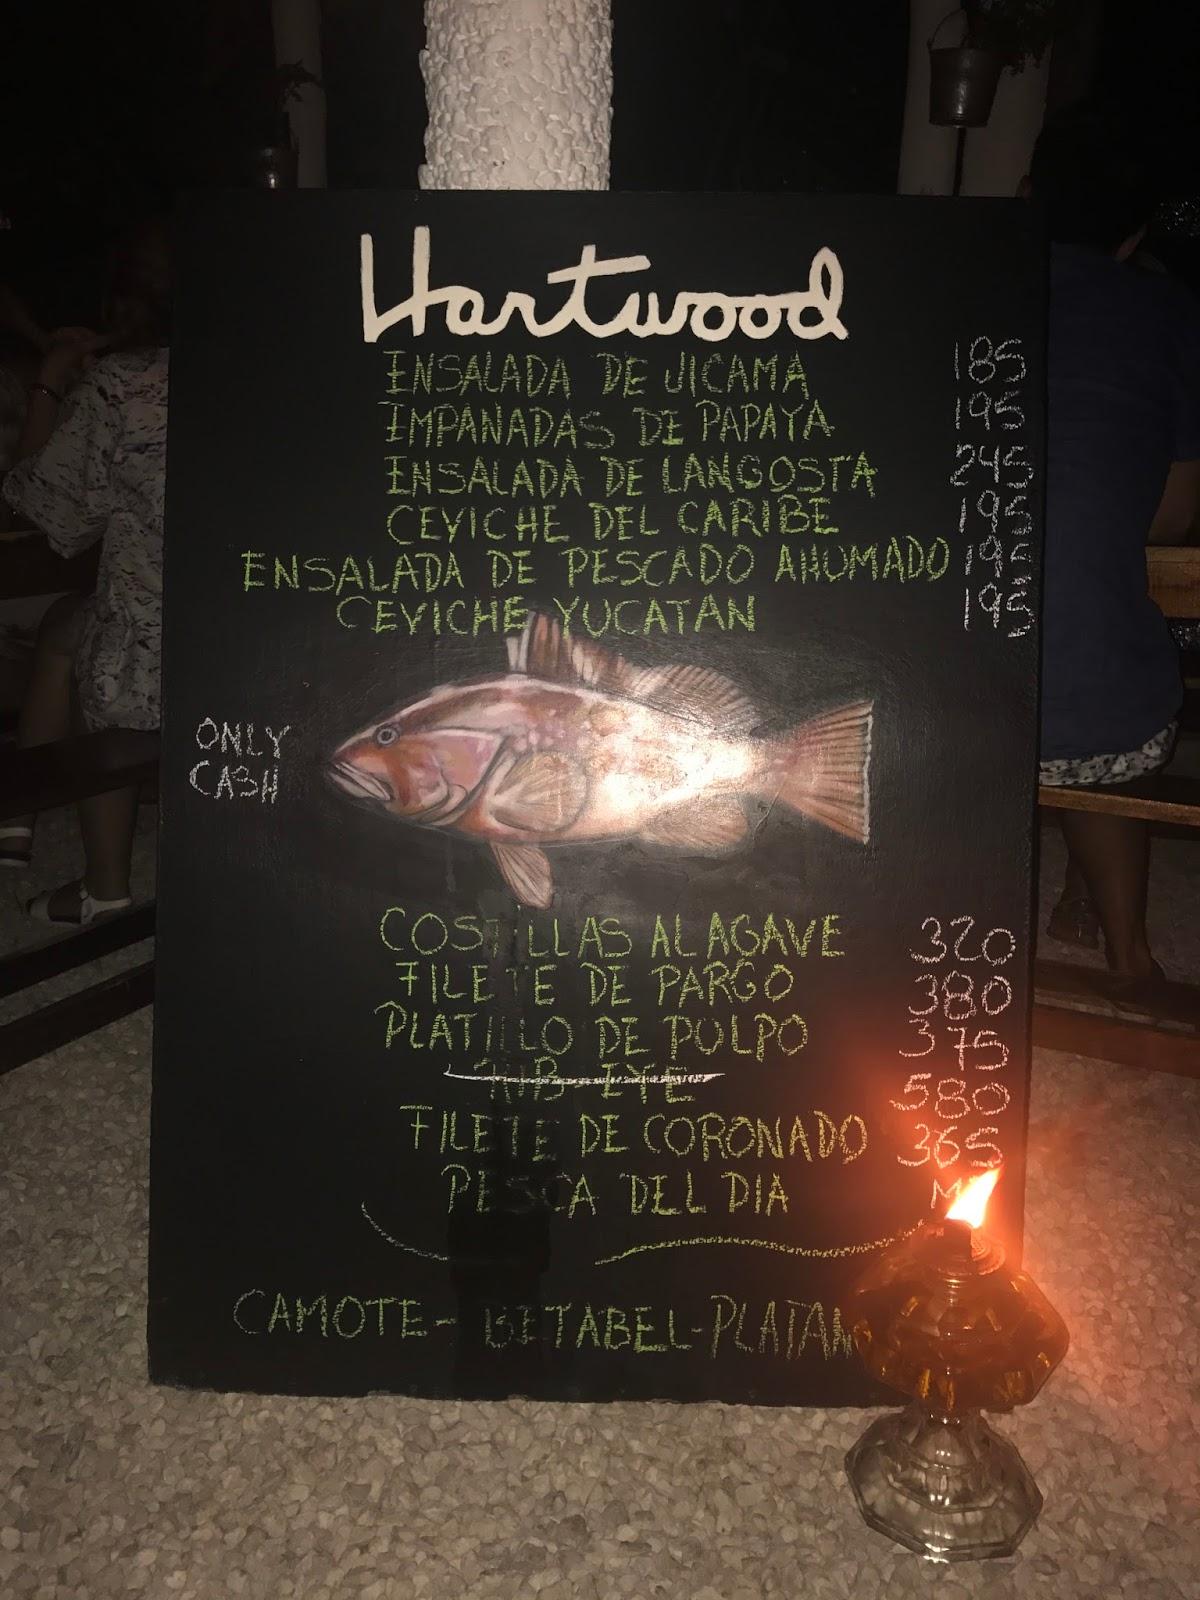 Stitch & Bear - Hartwood - Blackboard menu at Hartwood